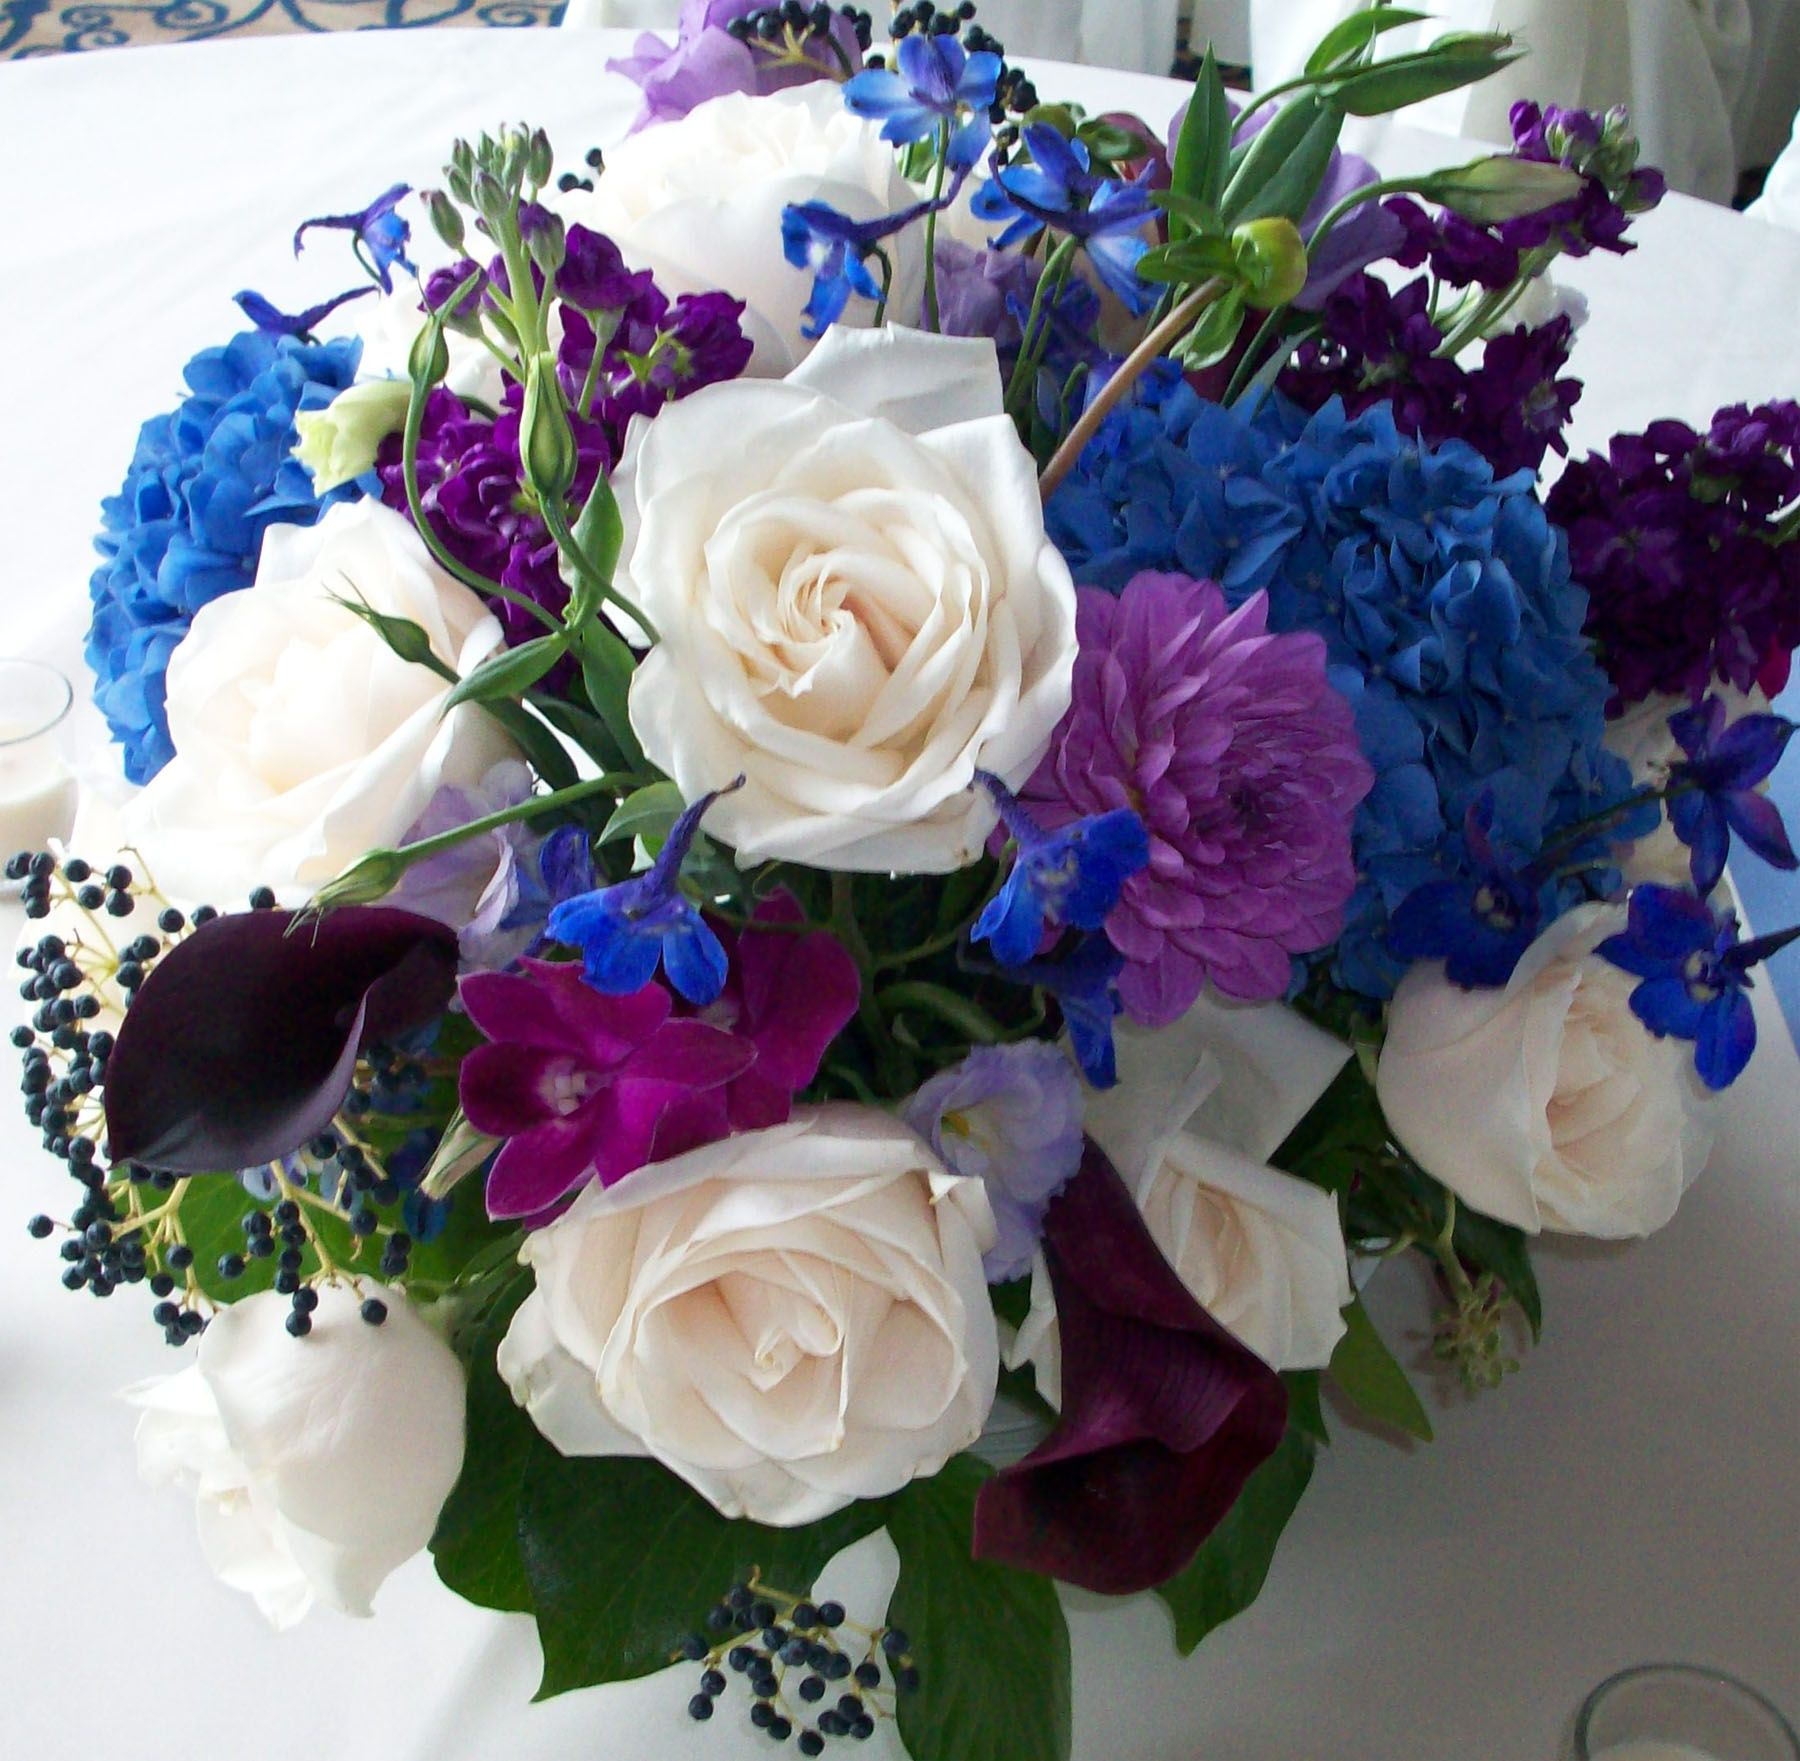 White Roses Purple Dahlia Orchids Callas Blue Hydrangea Centerpeice Wedding Flowersblue